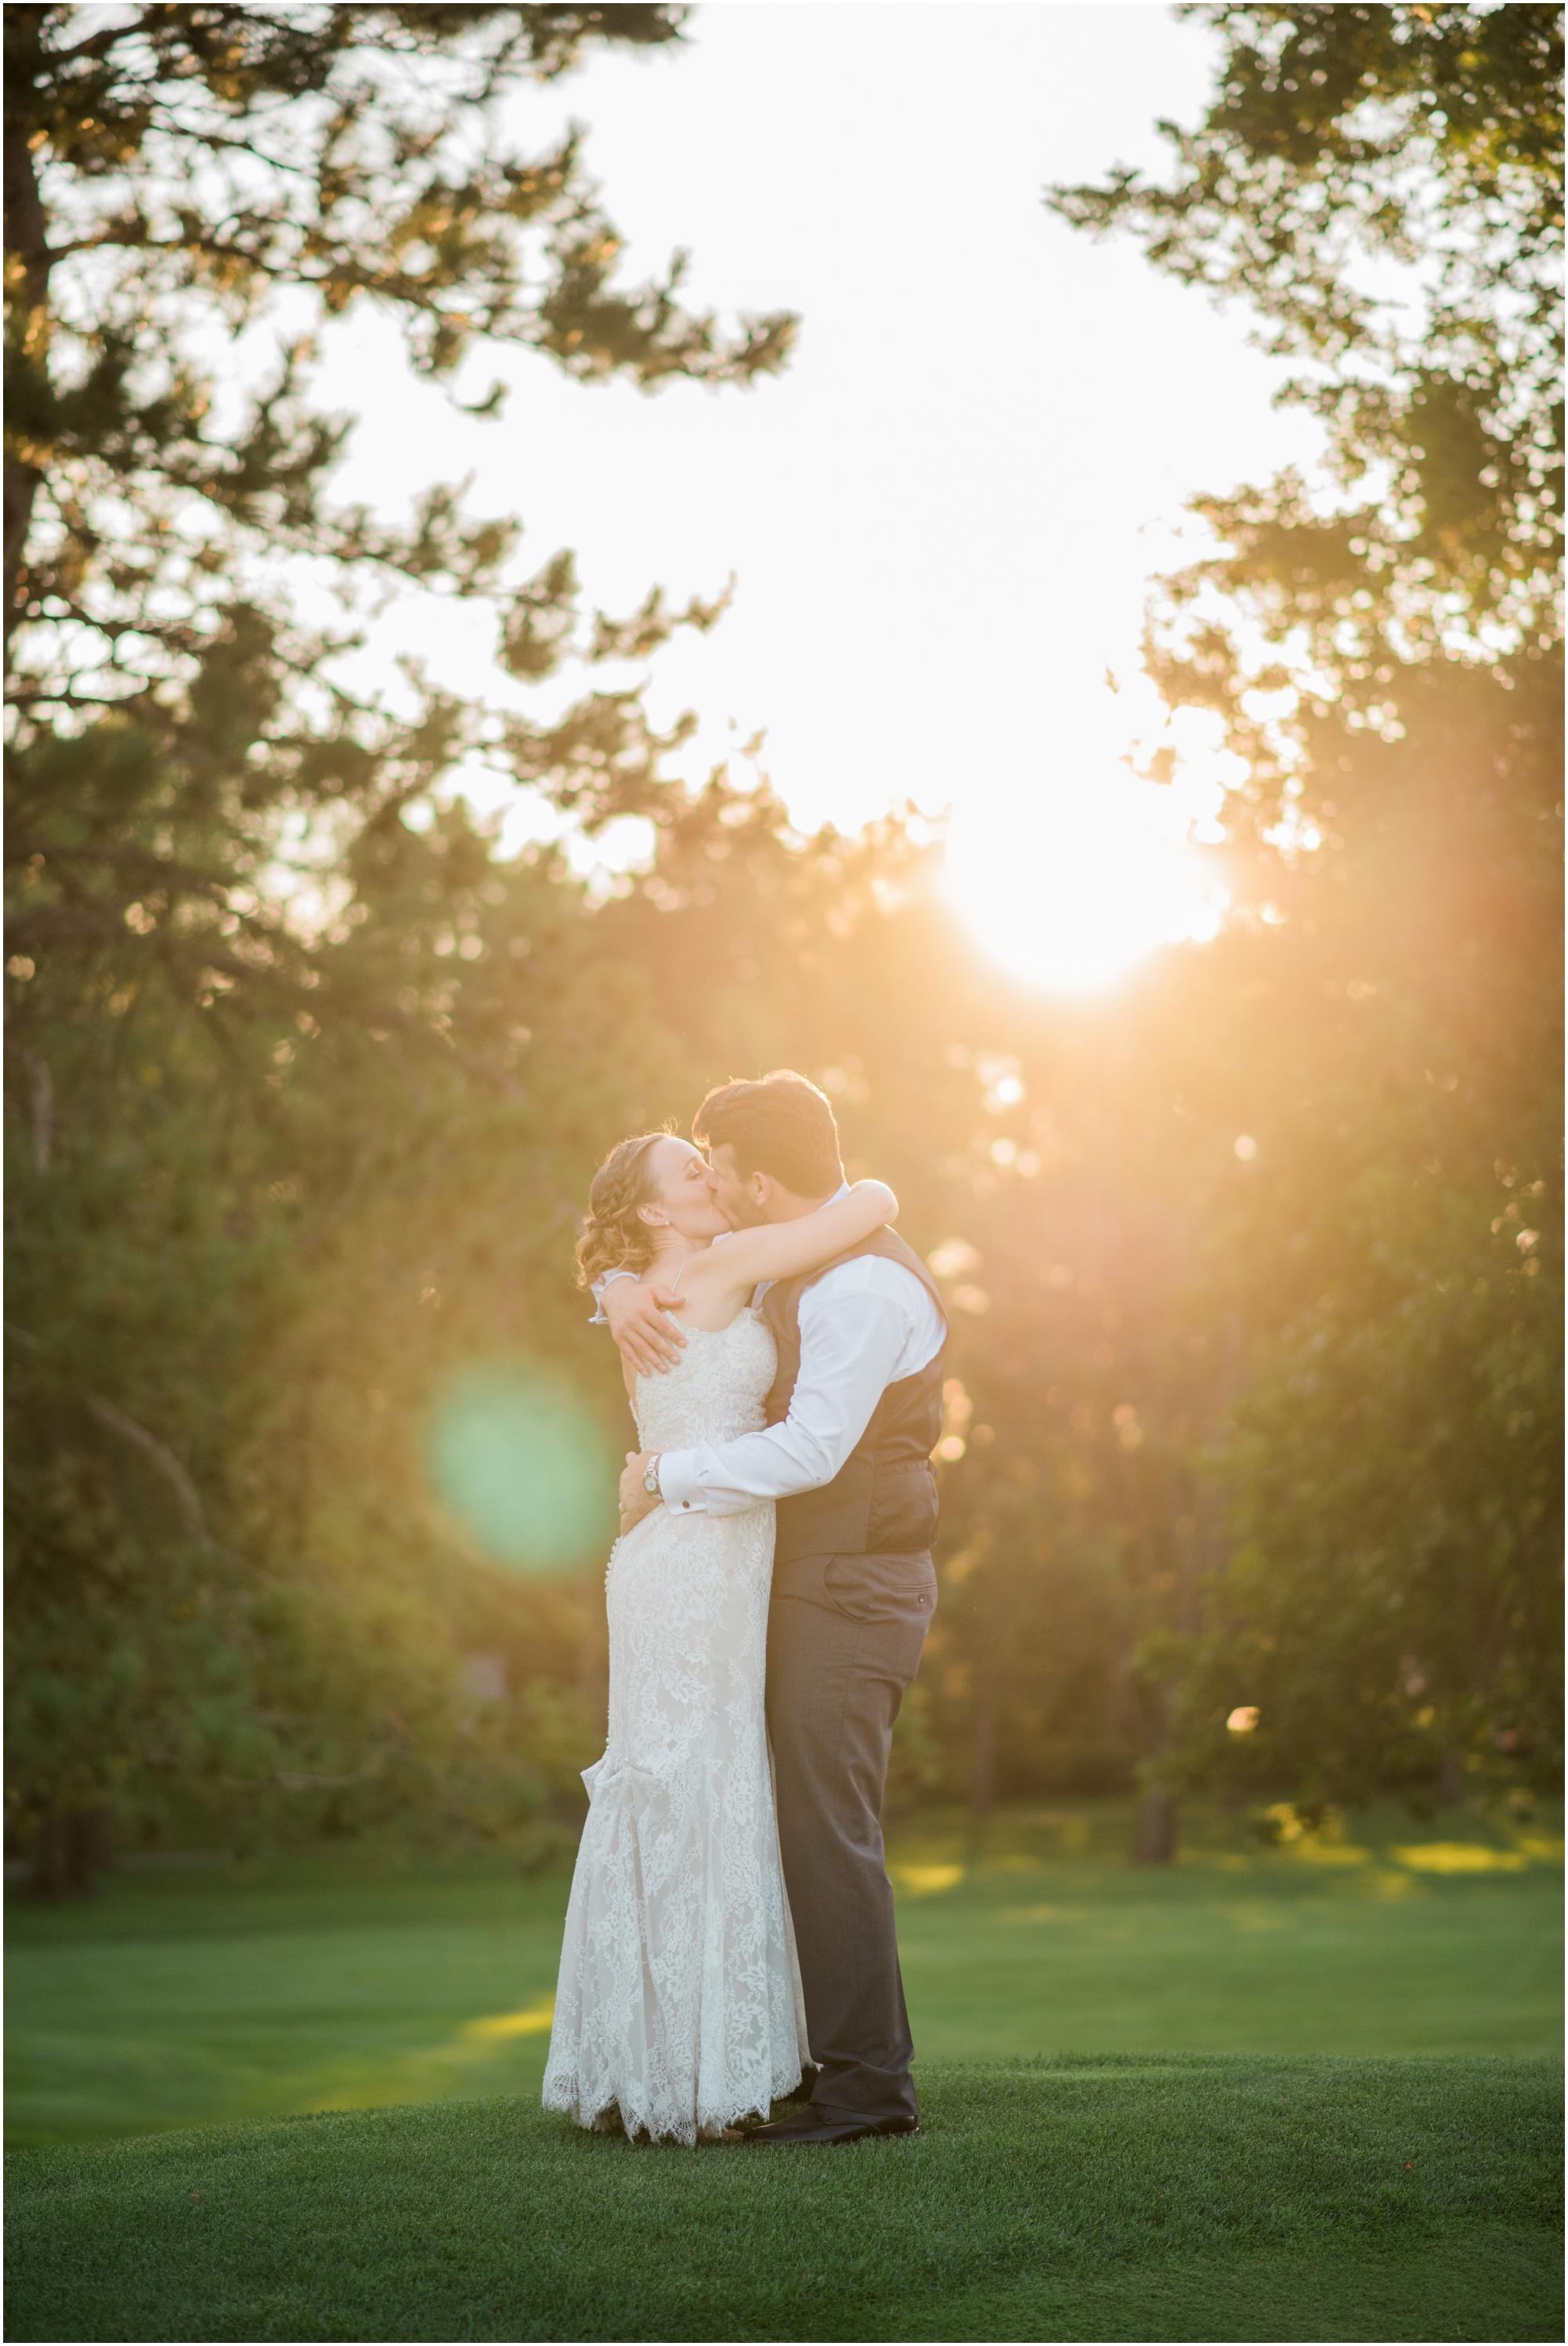 Wisconsin-Wedding-Photographer-Reedsburg-Country-Club-Kaela-and Matt-Wedding-830.jpg